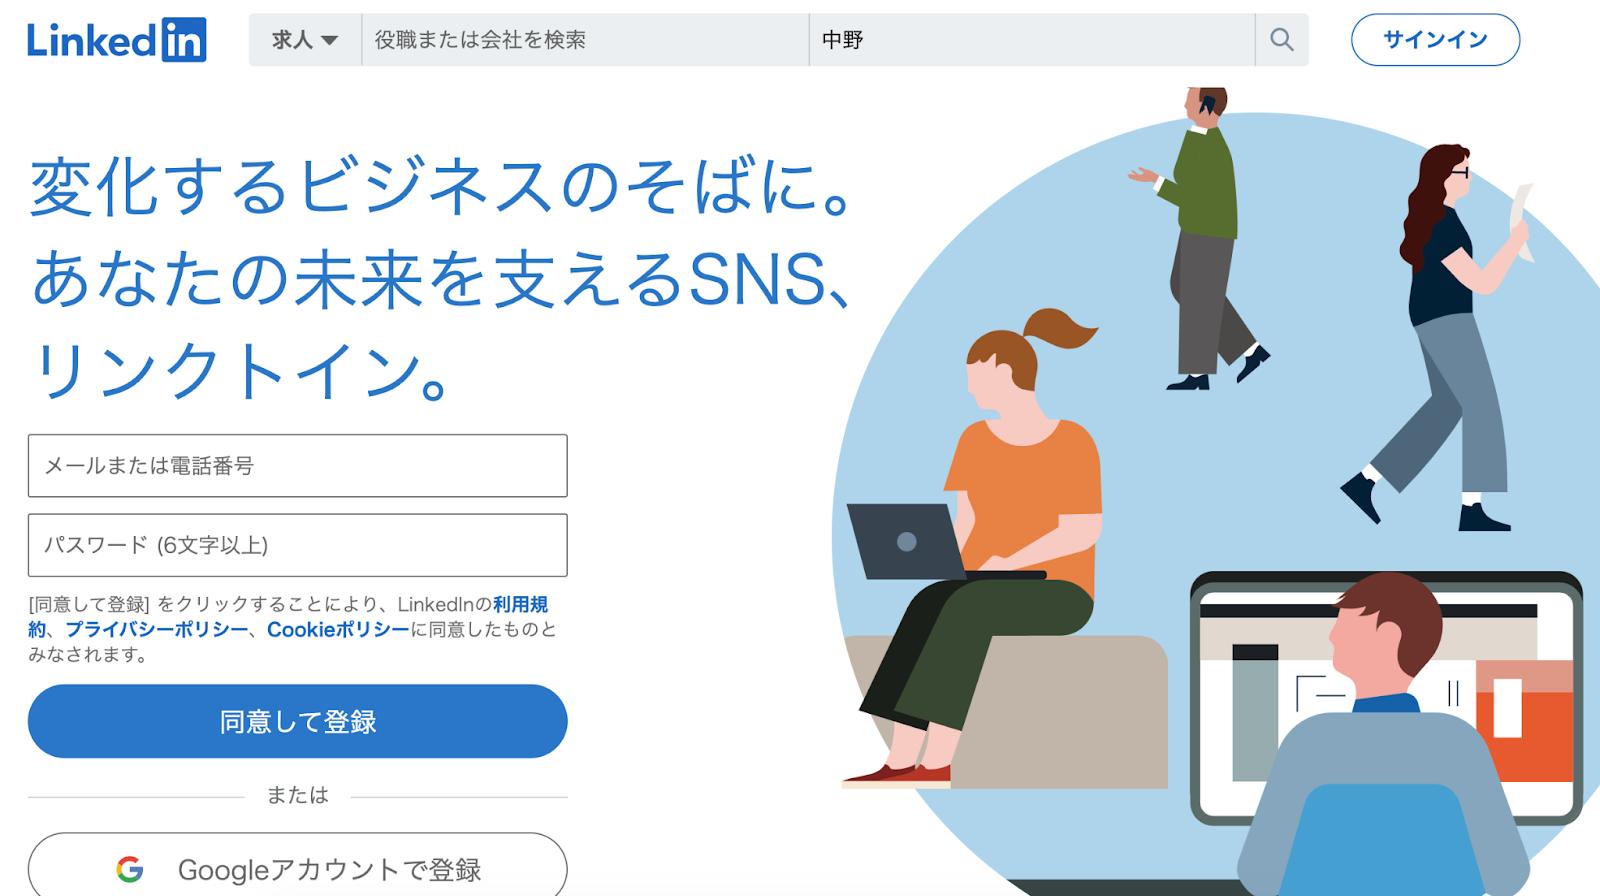 BtoBマーケティング用語集をアイウエオ順   「ラ」行編